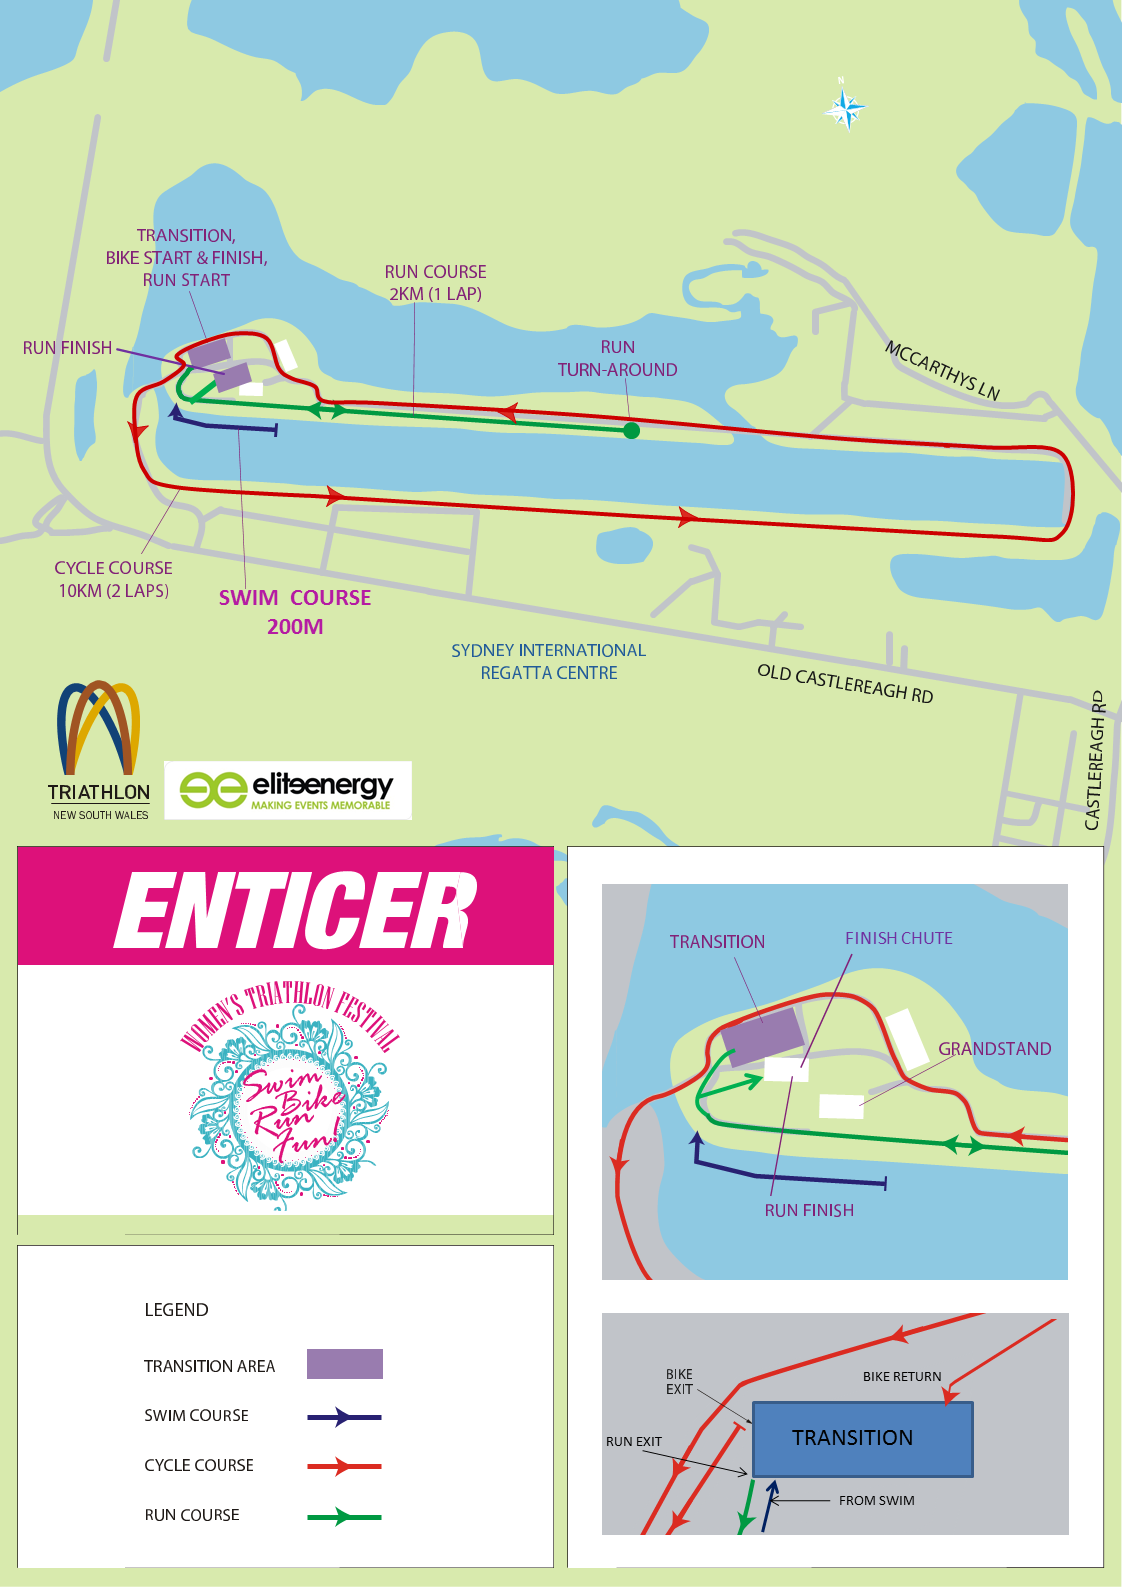 http://www.eliteenergy.com.au/wp-content/uploads/2015/06/Womens-Tri-Festival-Enticer-Map.png